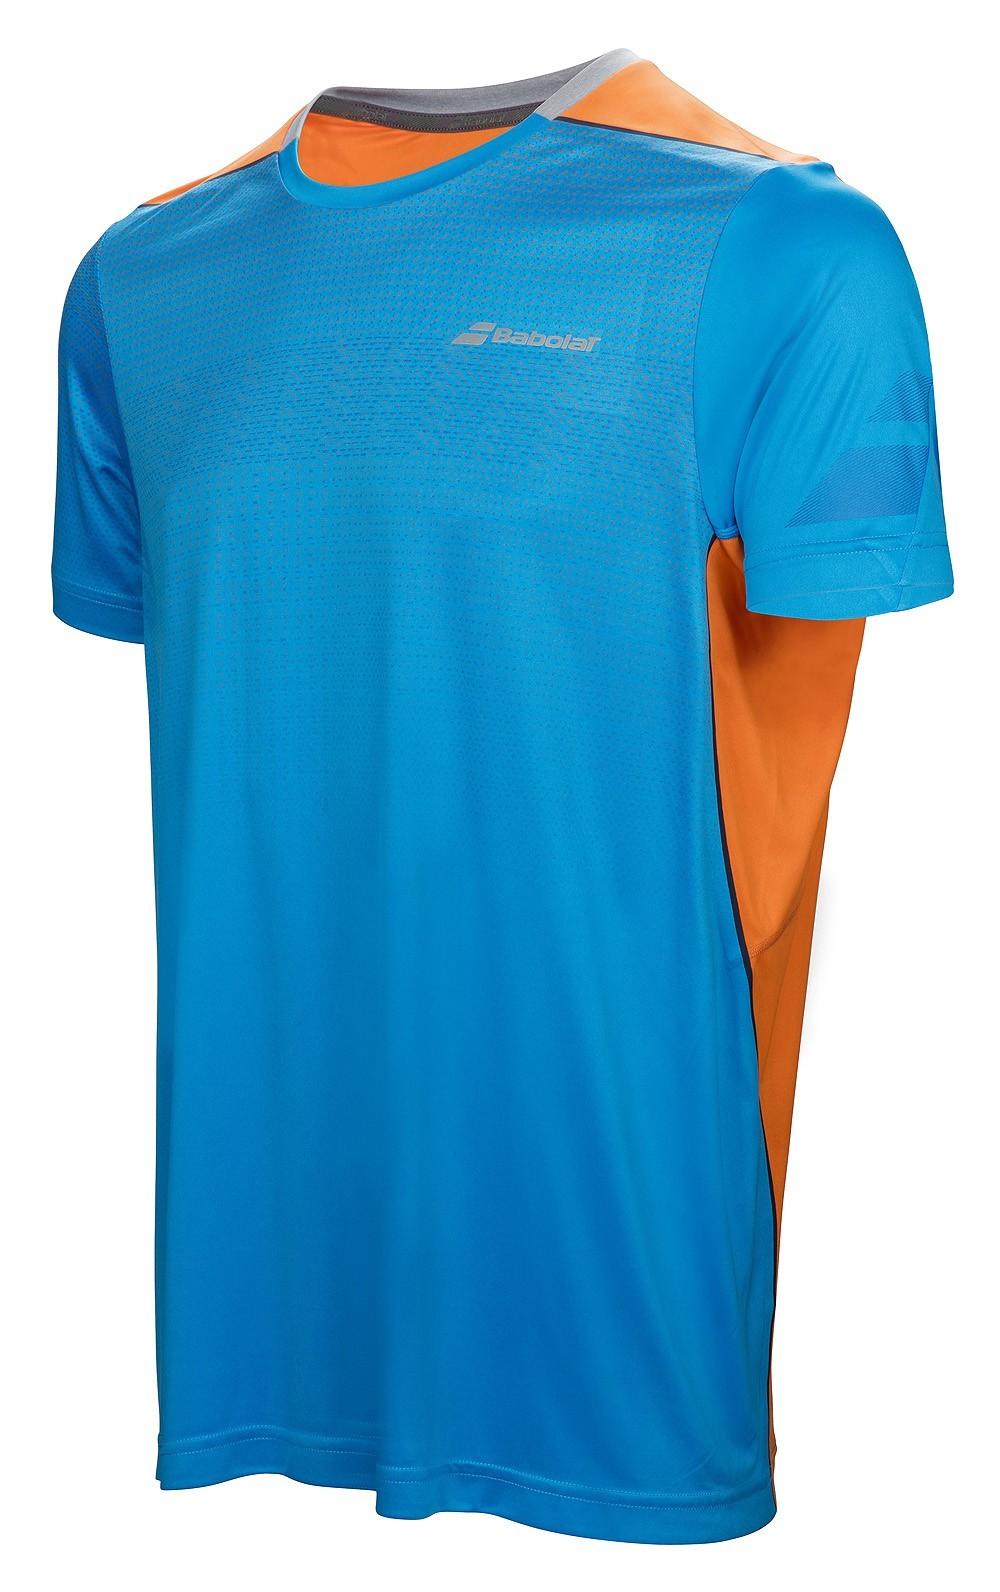 Koszulka tenisowa chłopięca Babolat Performance Crew Neck - 50%